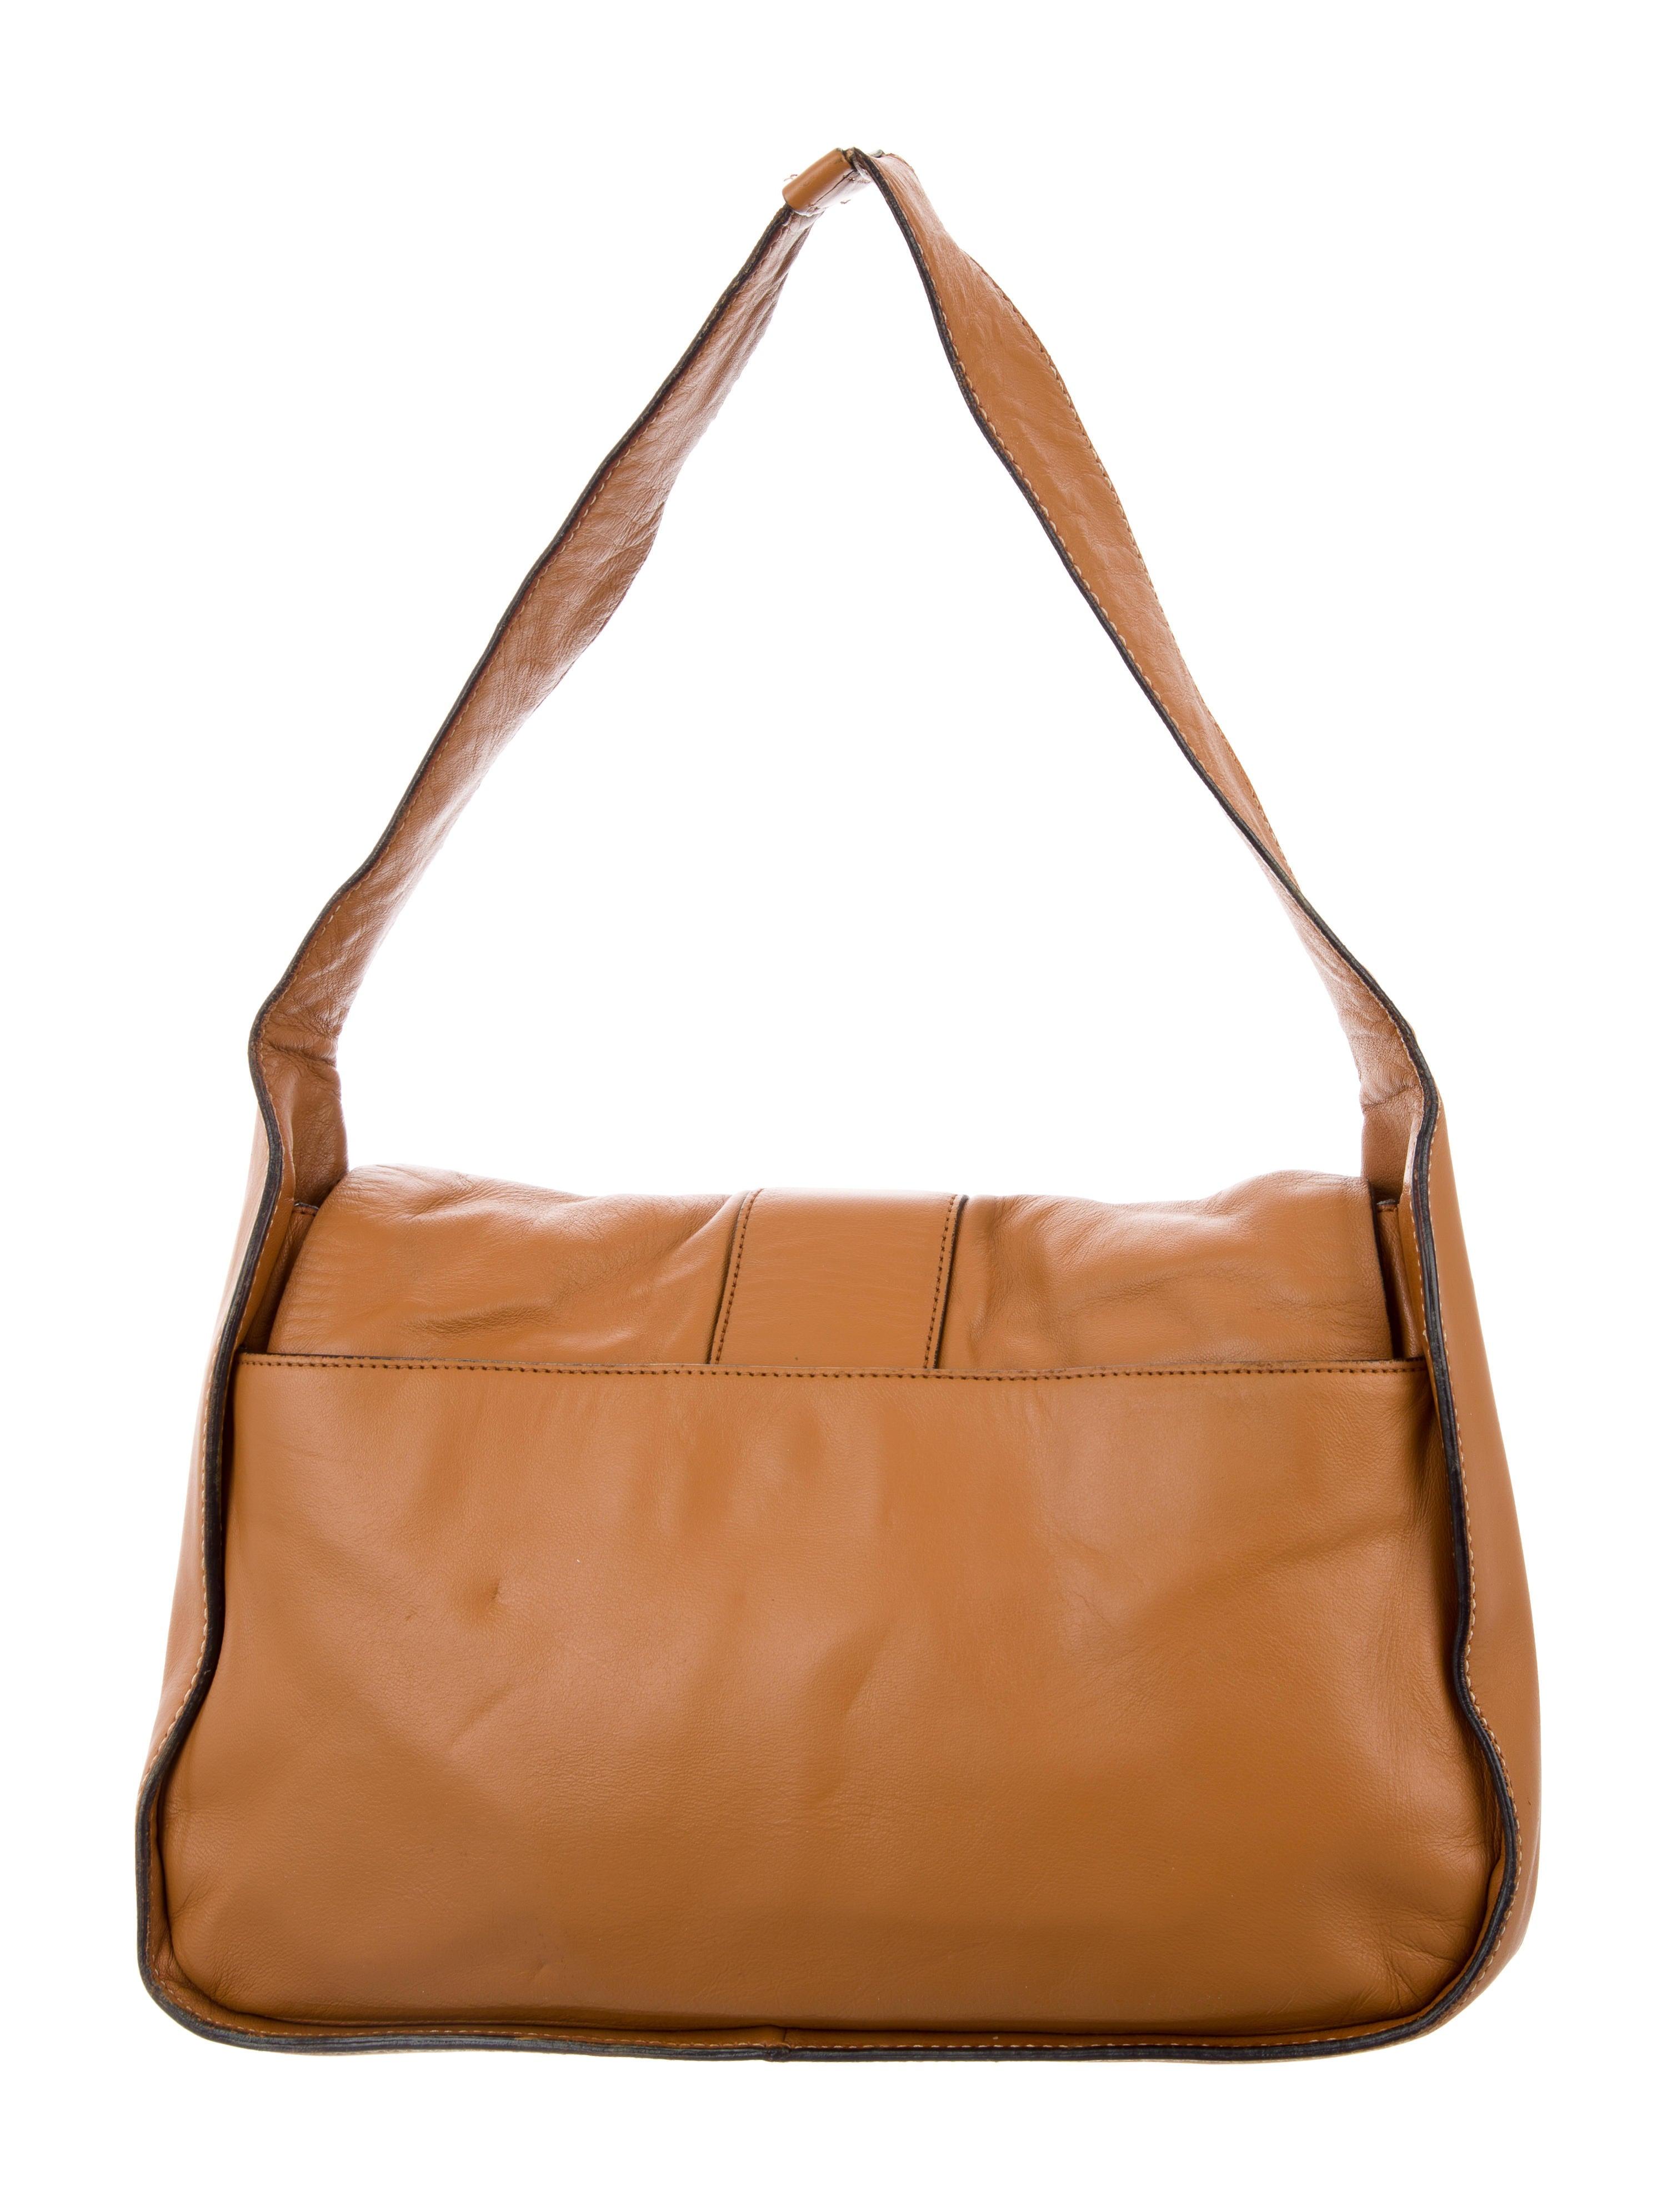 b9d66c512788 Prada Leather Buckle Shoulder Bag - Handbags - PRA174616 | The RealReal